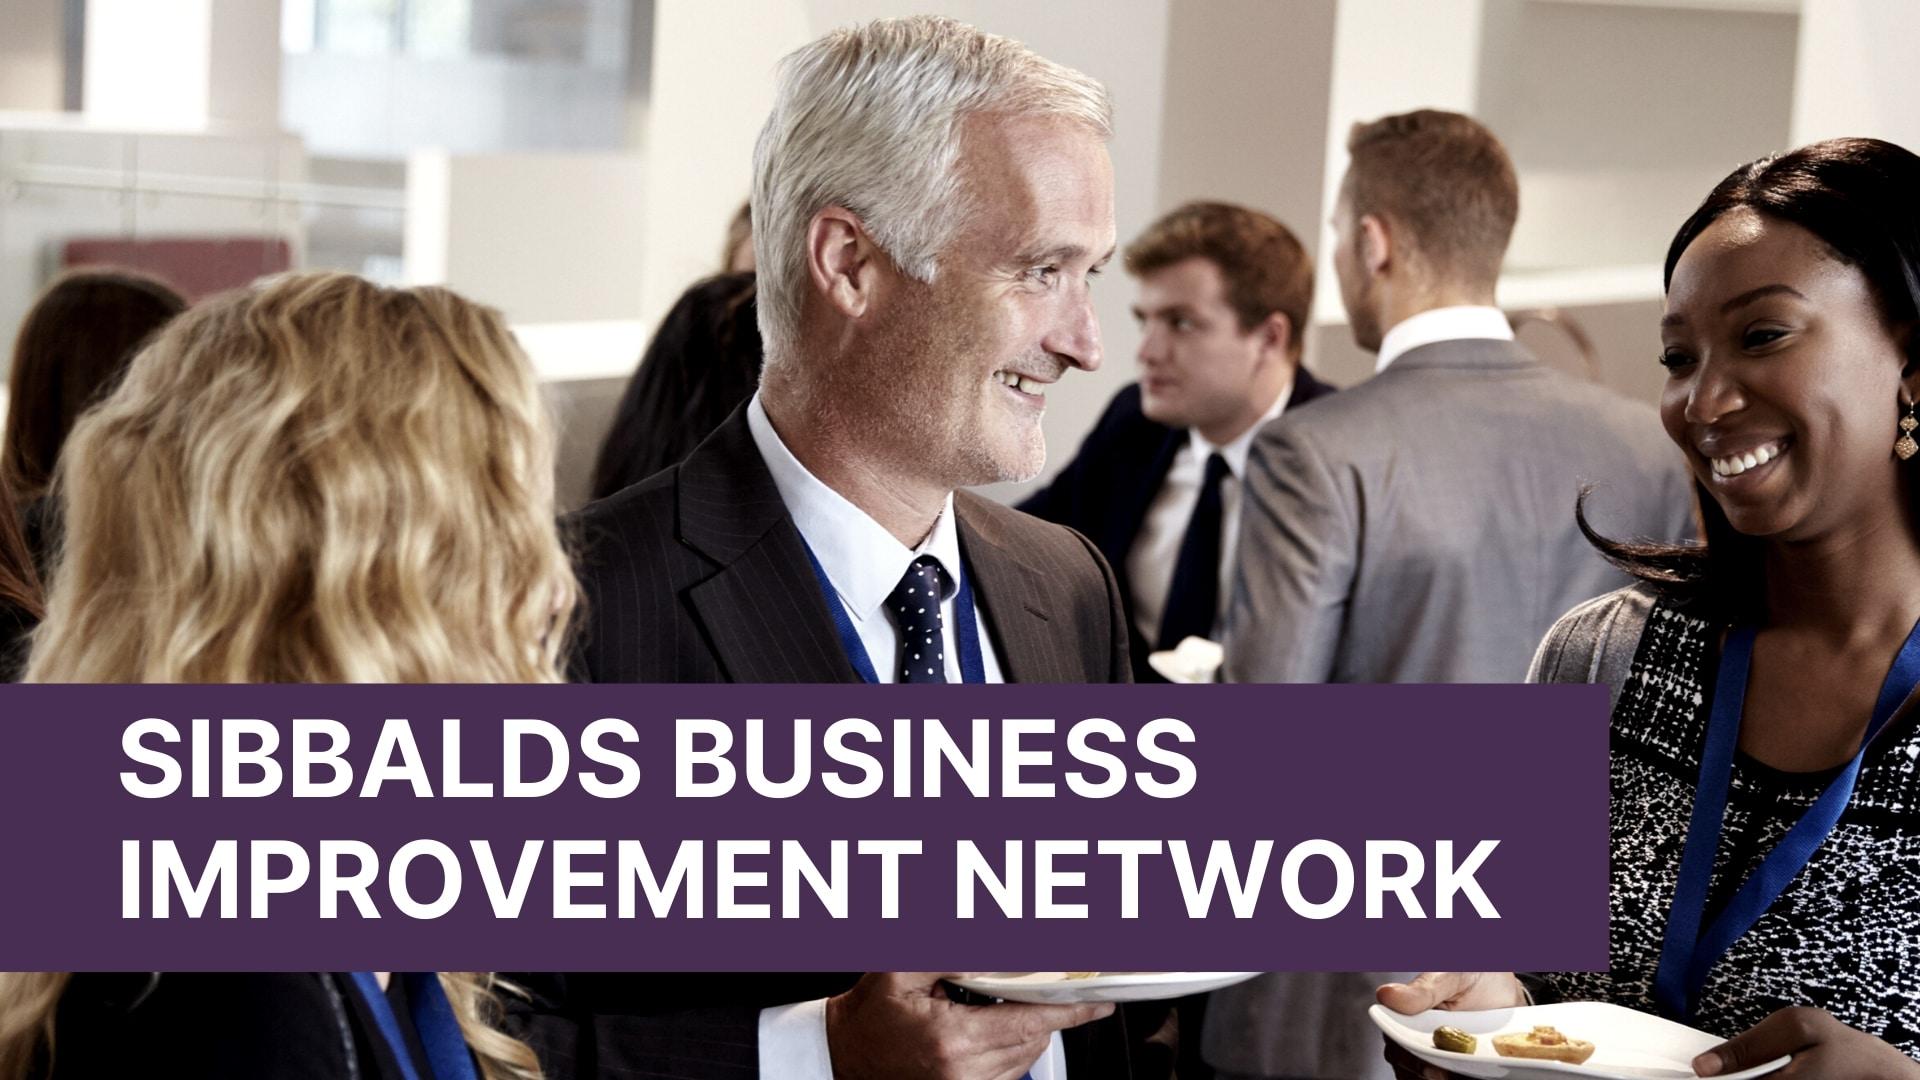 Sibbalds' Business Improvement Network